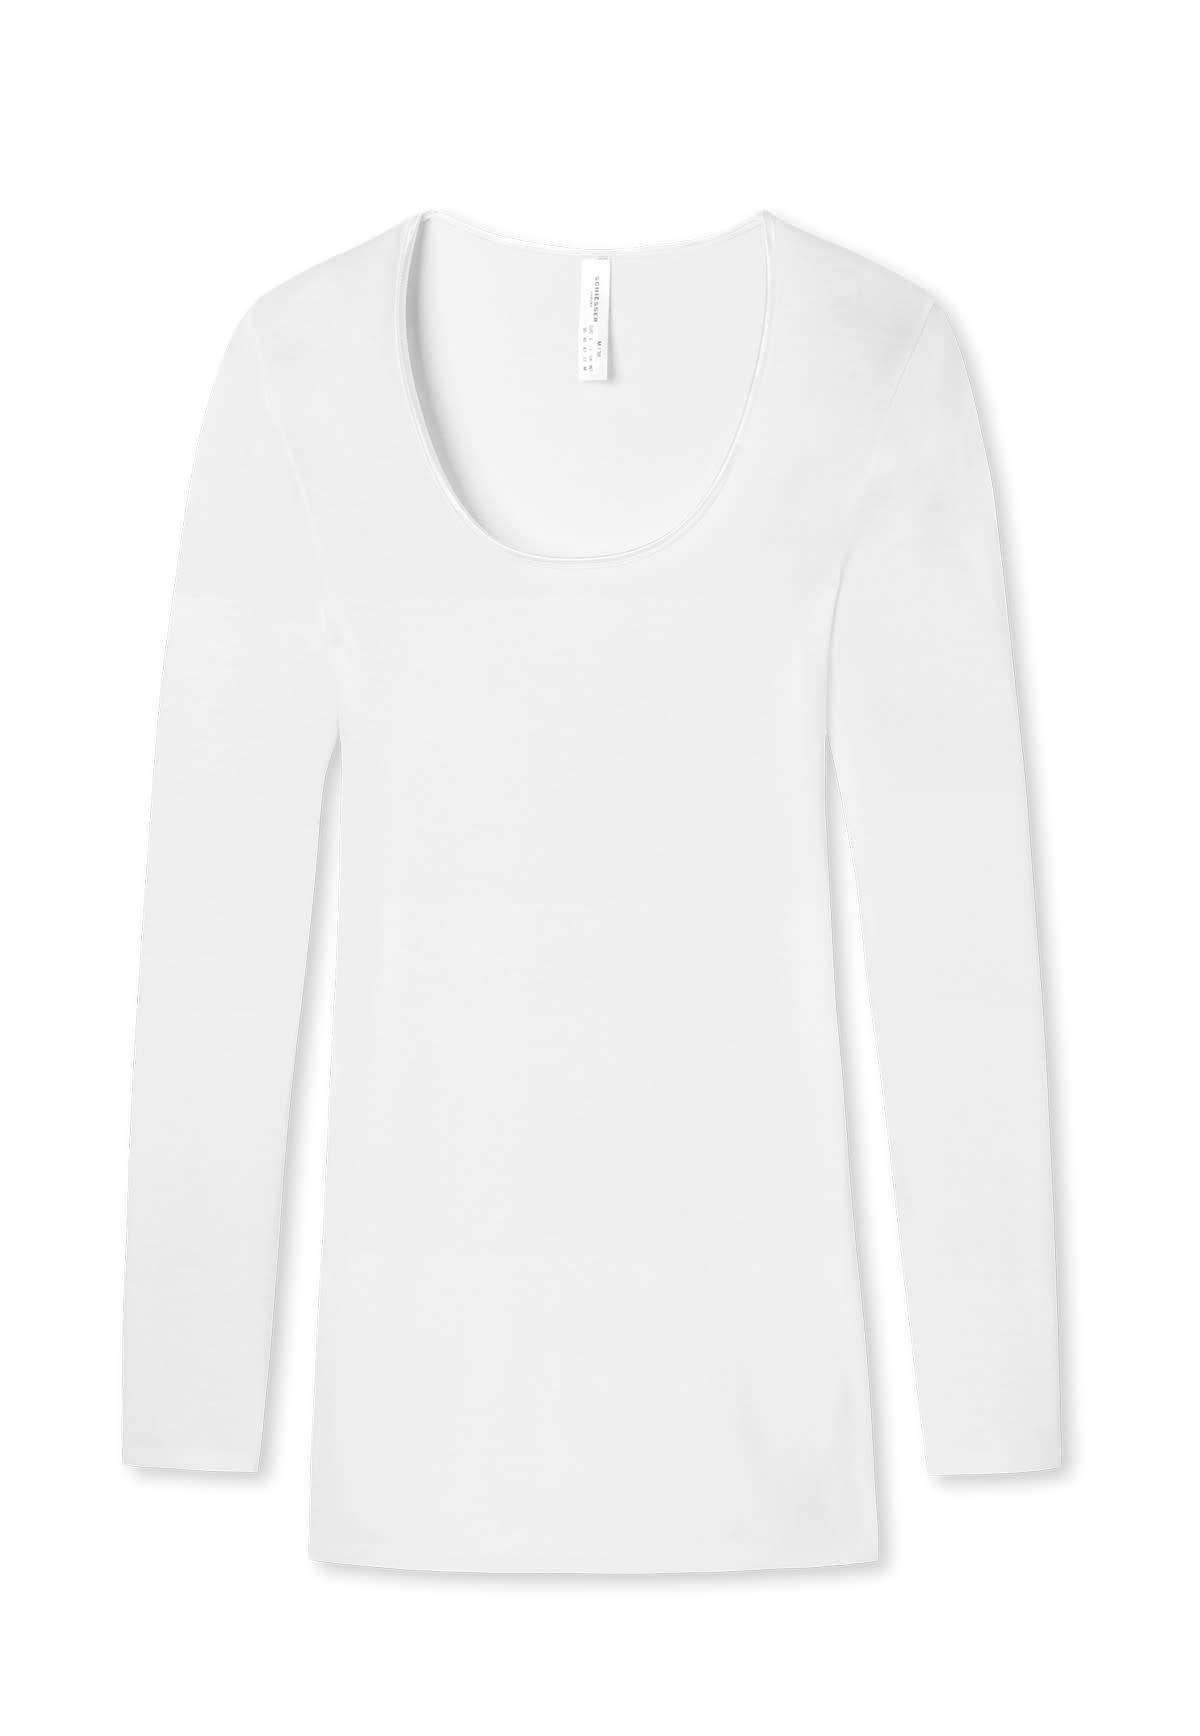 T-shirt lange mouw Luxury 200765 - wit-3